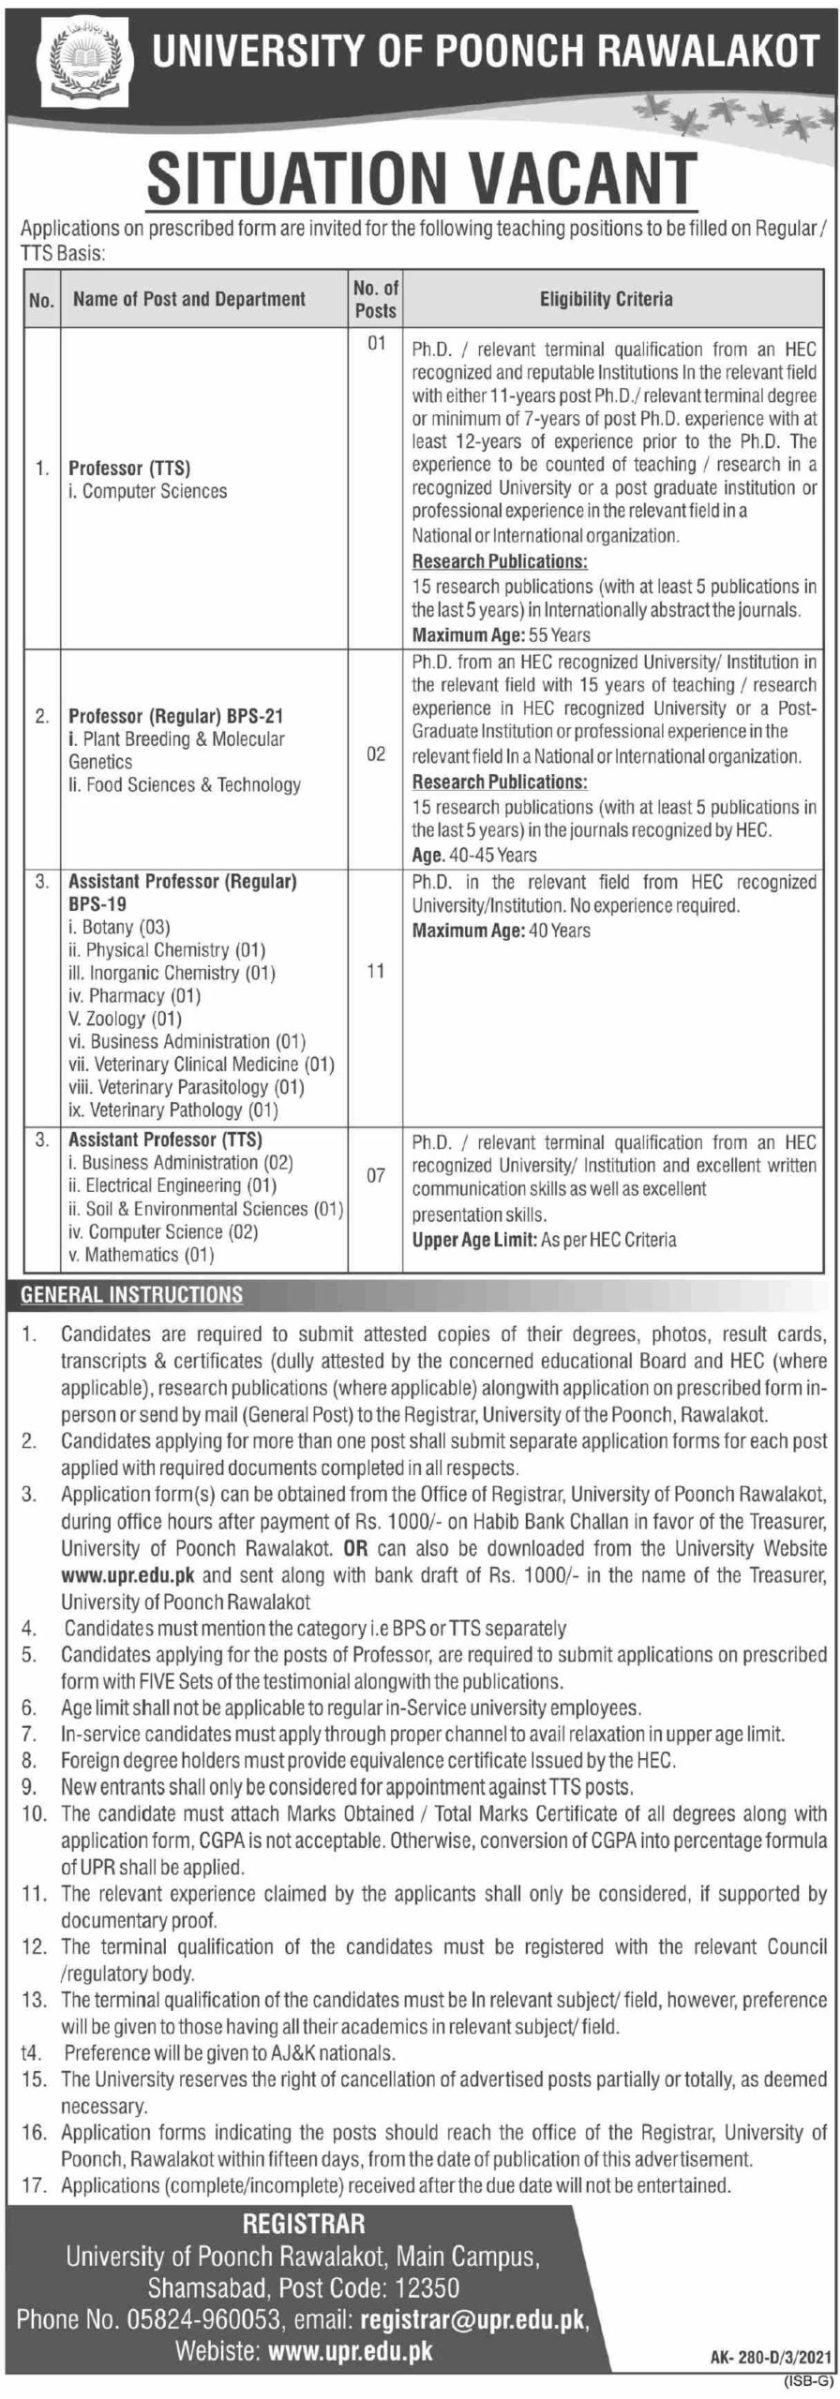 University of Poonch Rawalakot UPR Jobs 2021